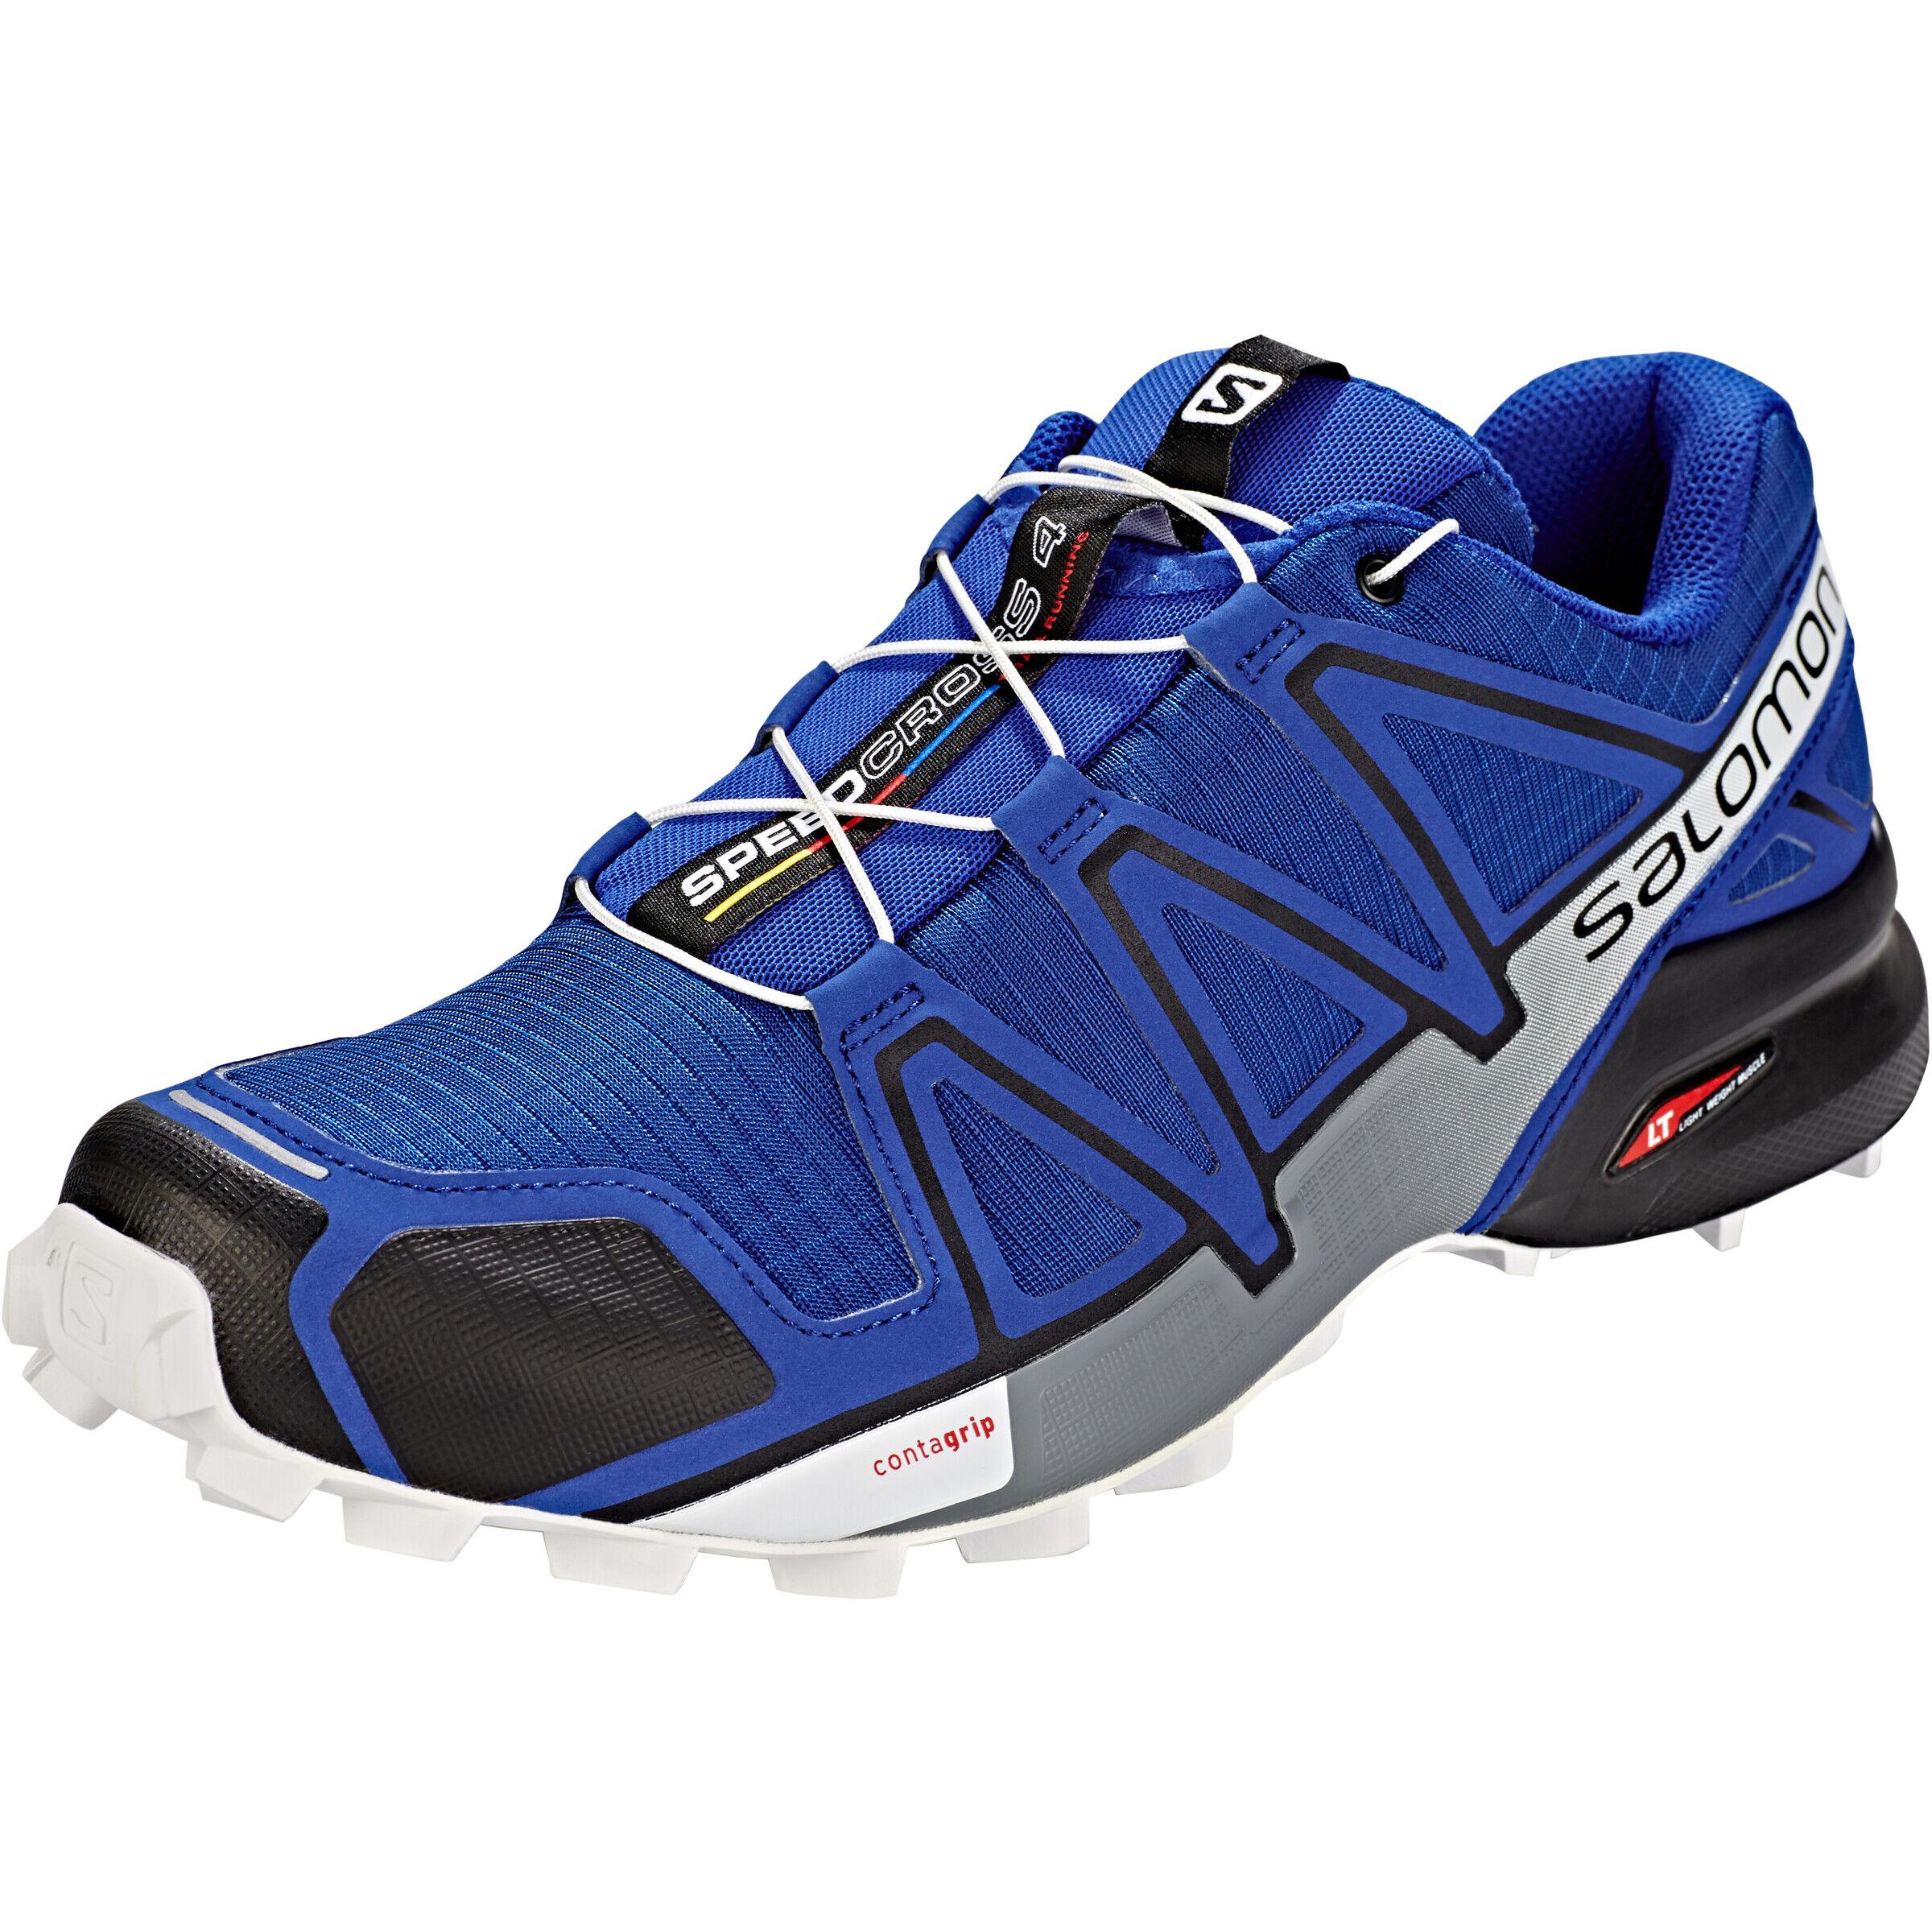 Salomon Speedcross 4 Schuhe Herren mazarine blue wilblackwhite